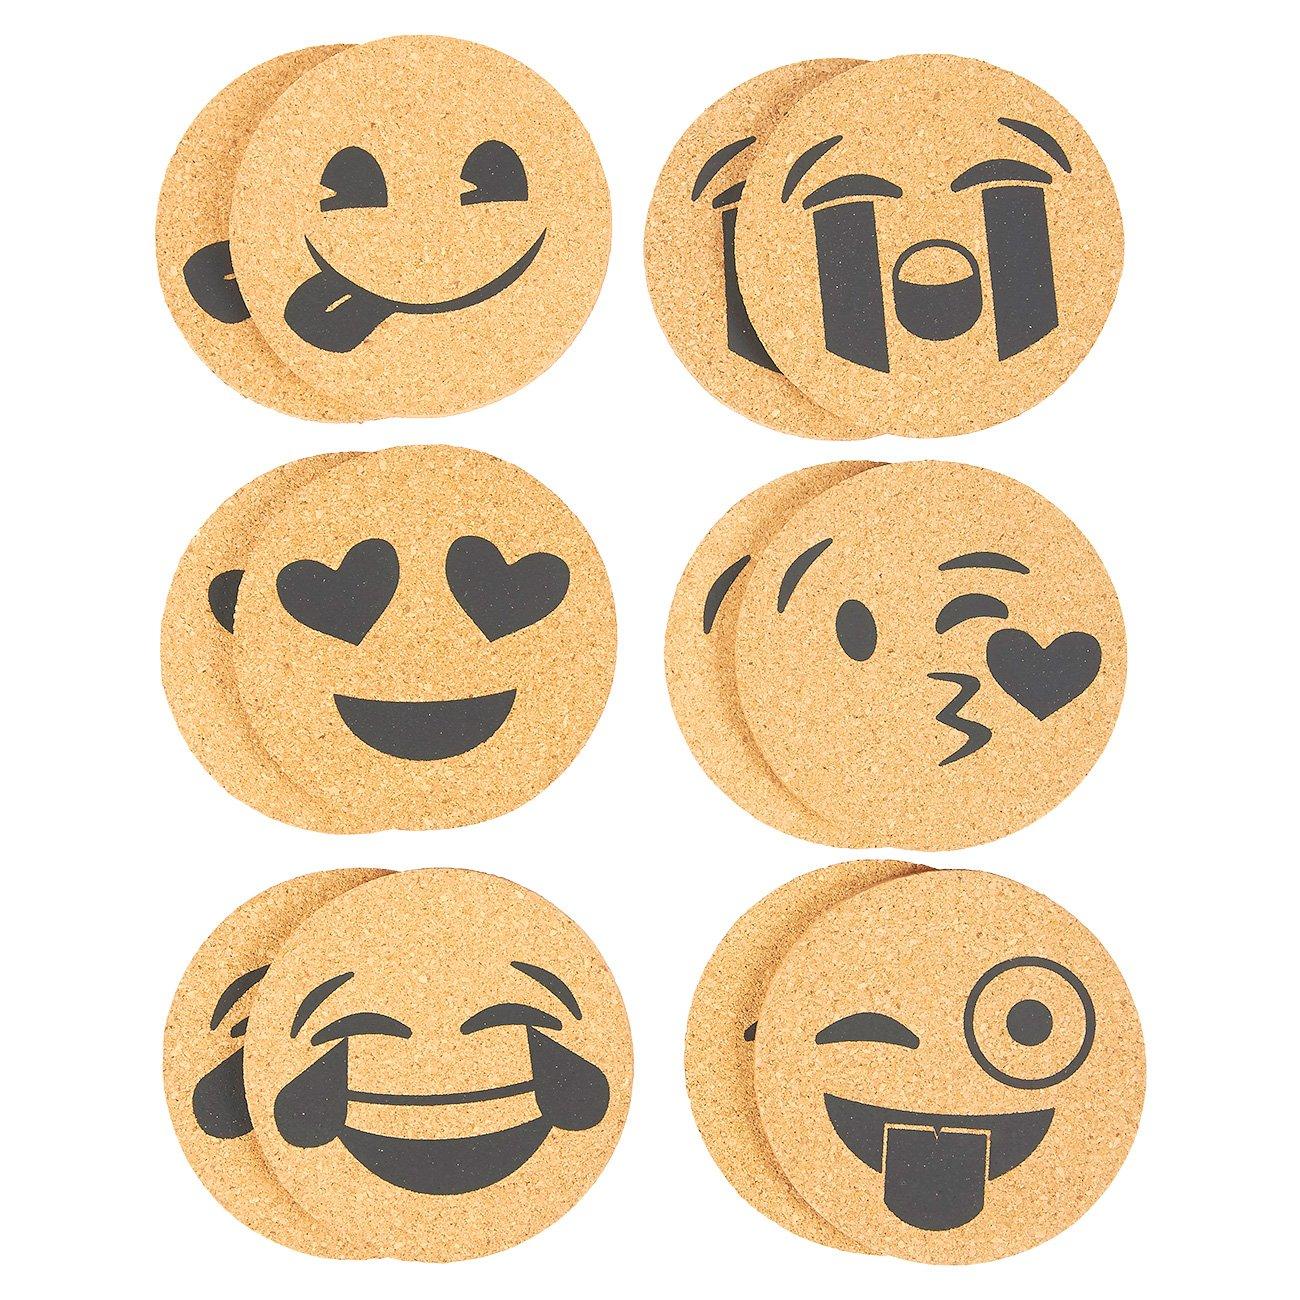 Juvale Pack of 12 Drink Coasters - Emoji Designed Cork Coasters, Funny Novelty Coasters for Cold Drinks, Hot Beverage, Bar Drinks Coaster Set - 6 Emoji Faces Assorted, 4 inches